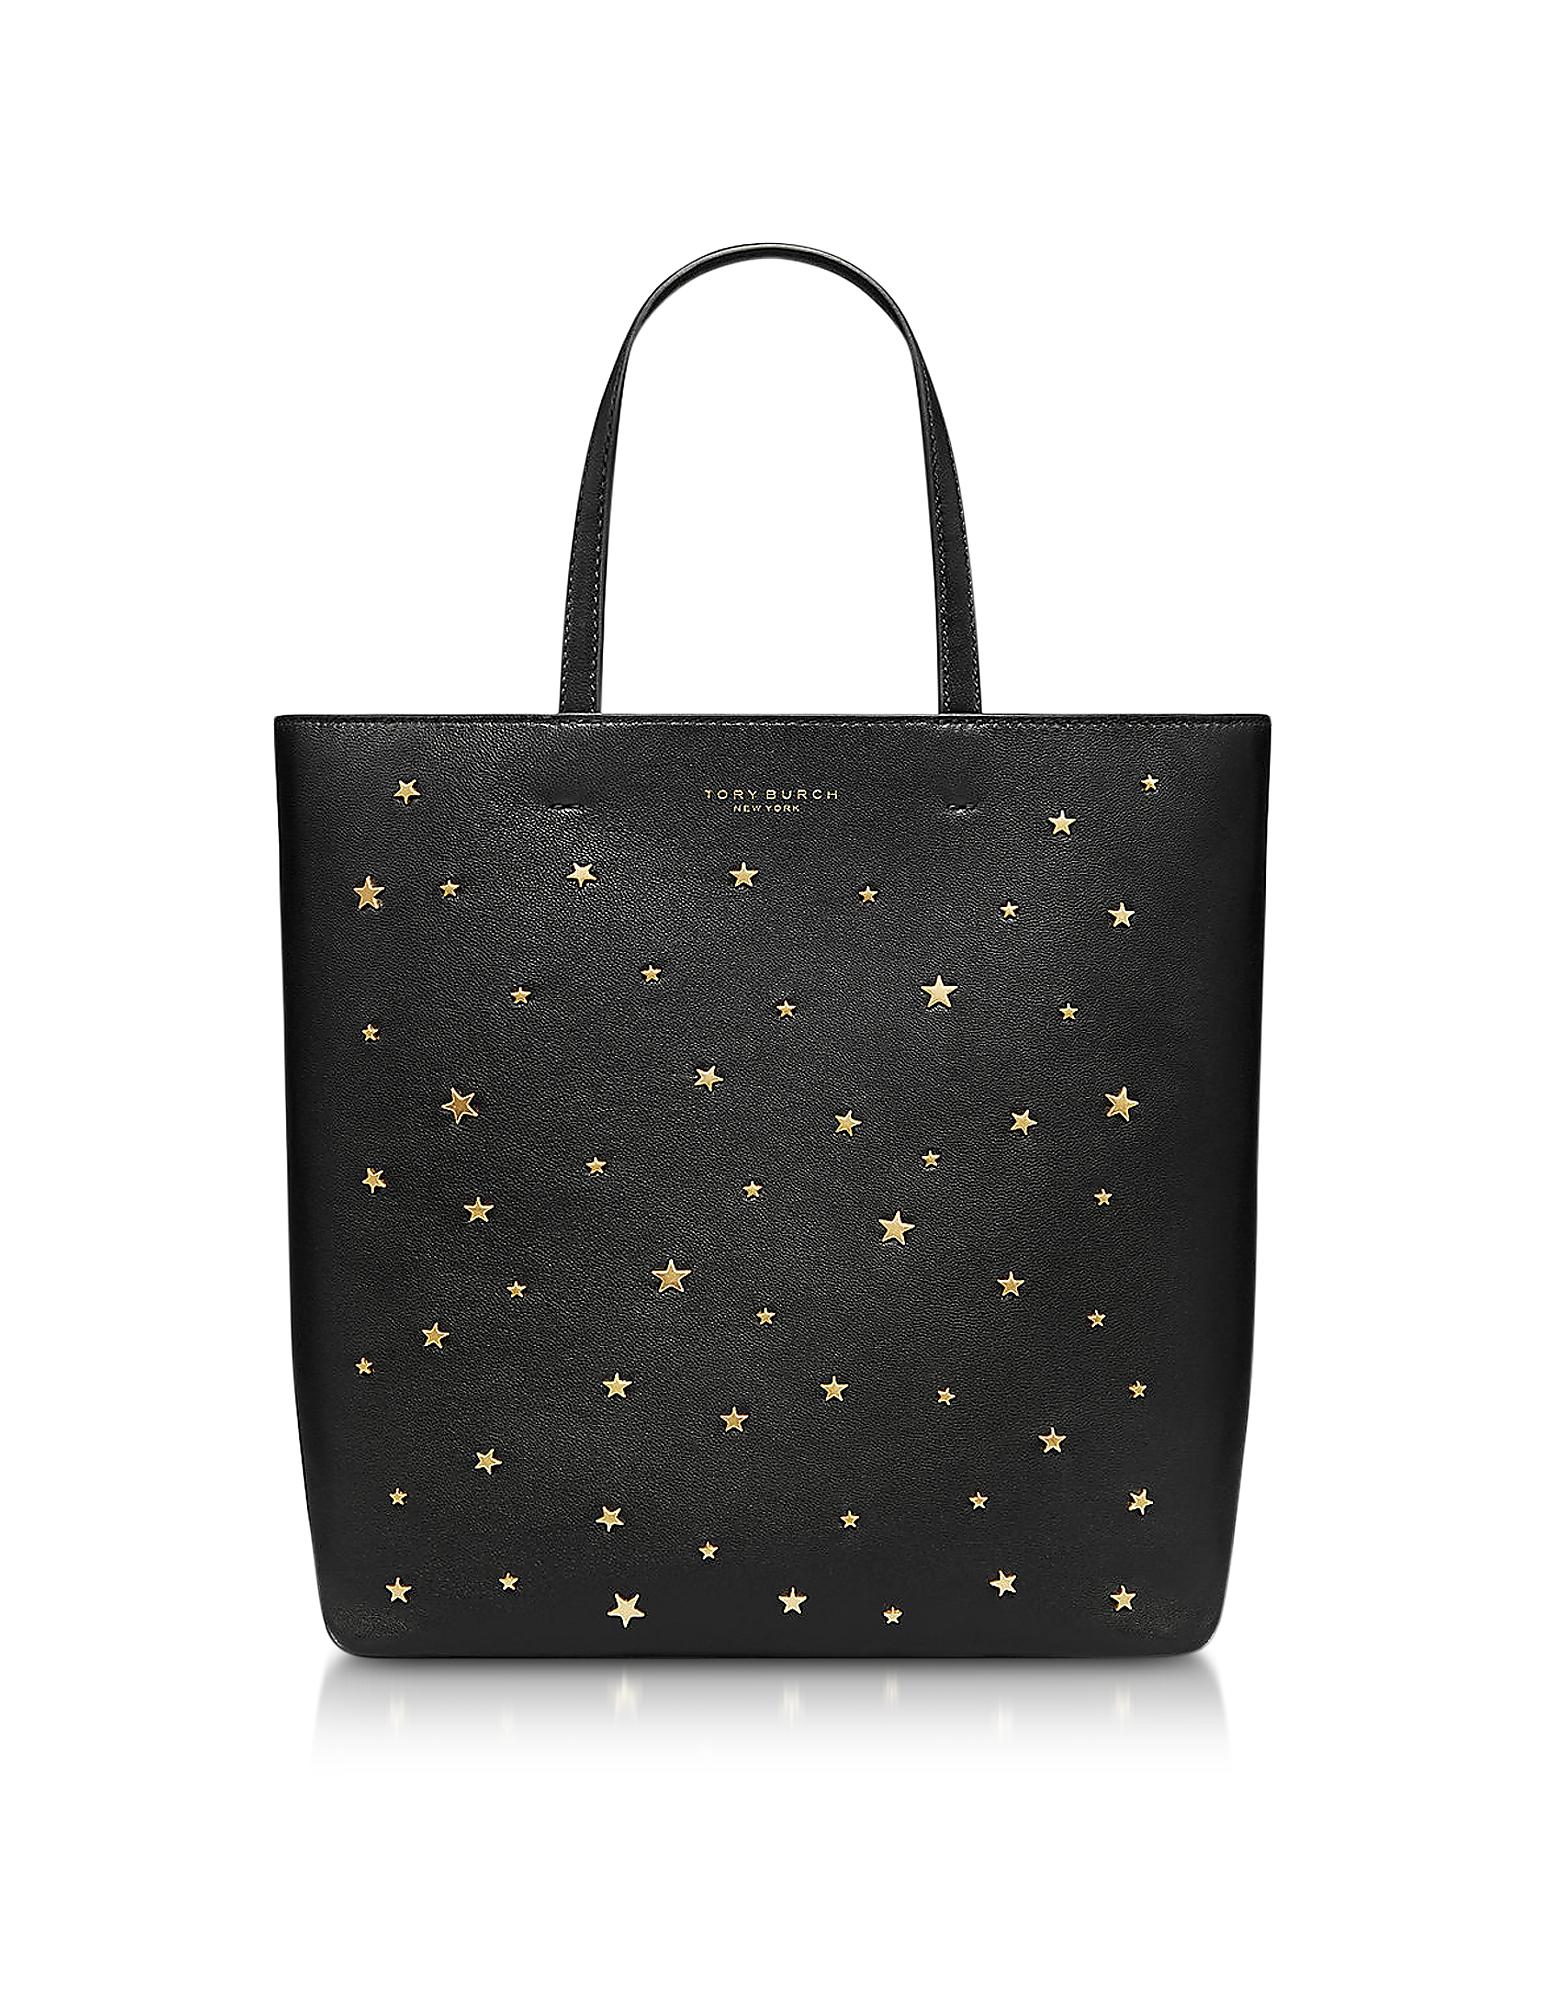 Black Star Studs Small Tote Bag